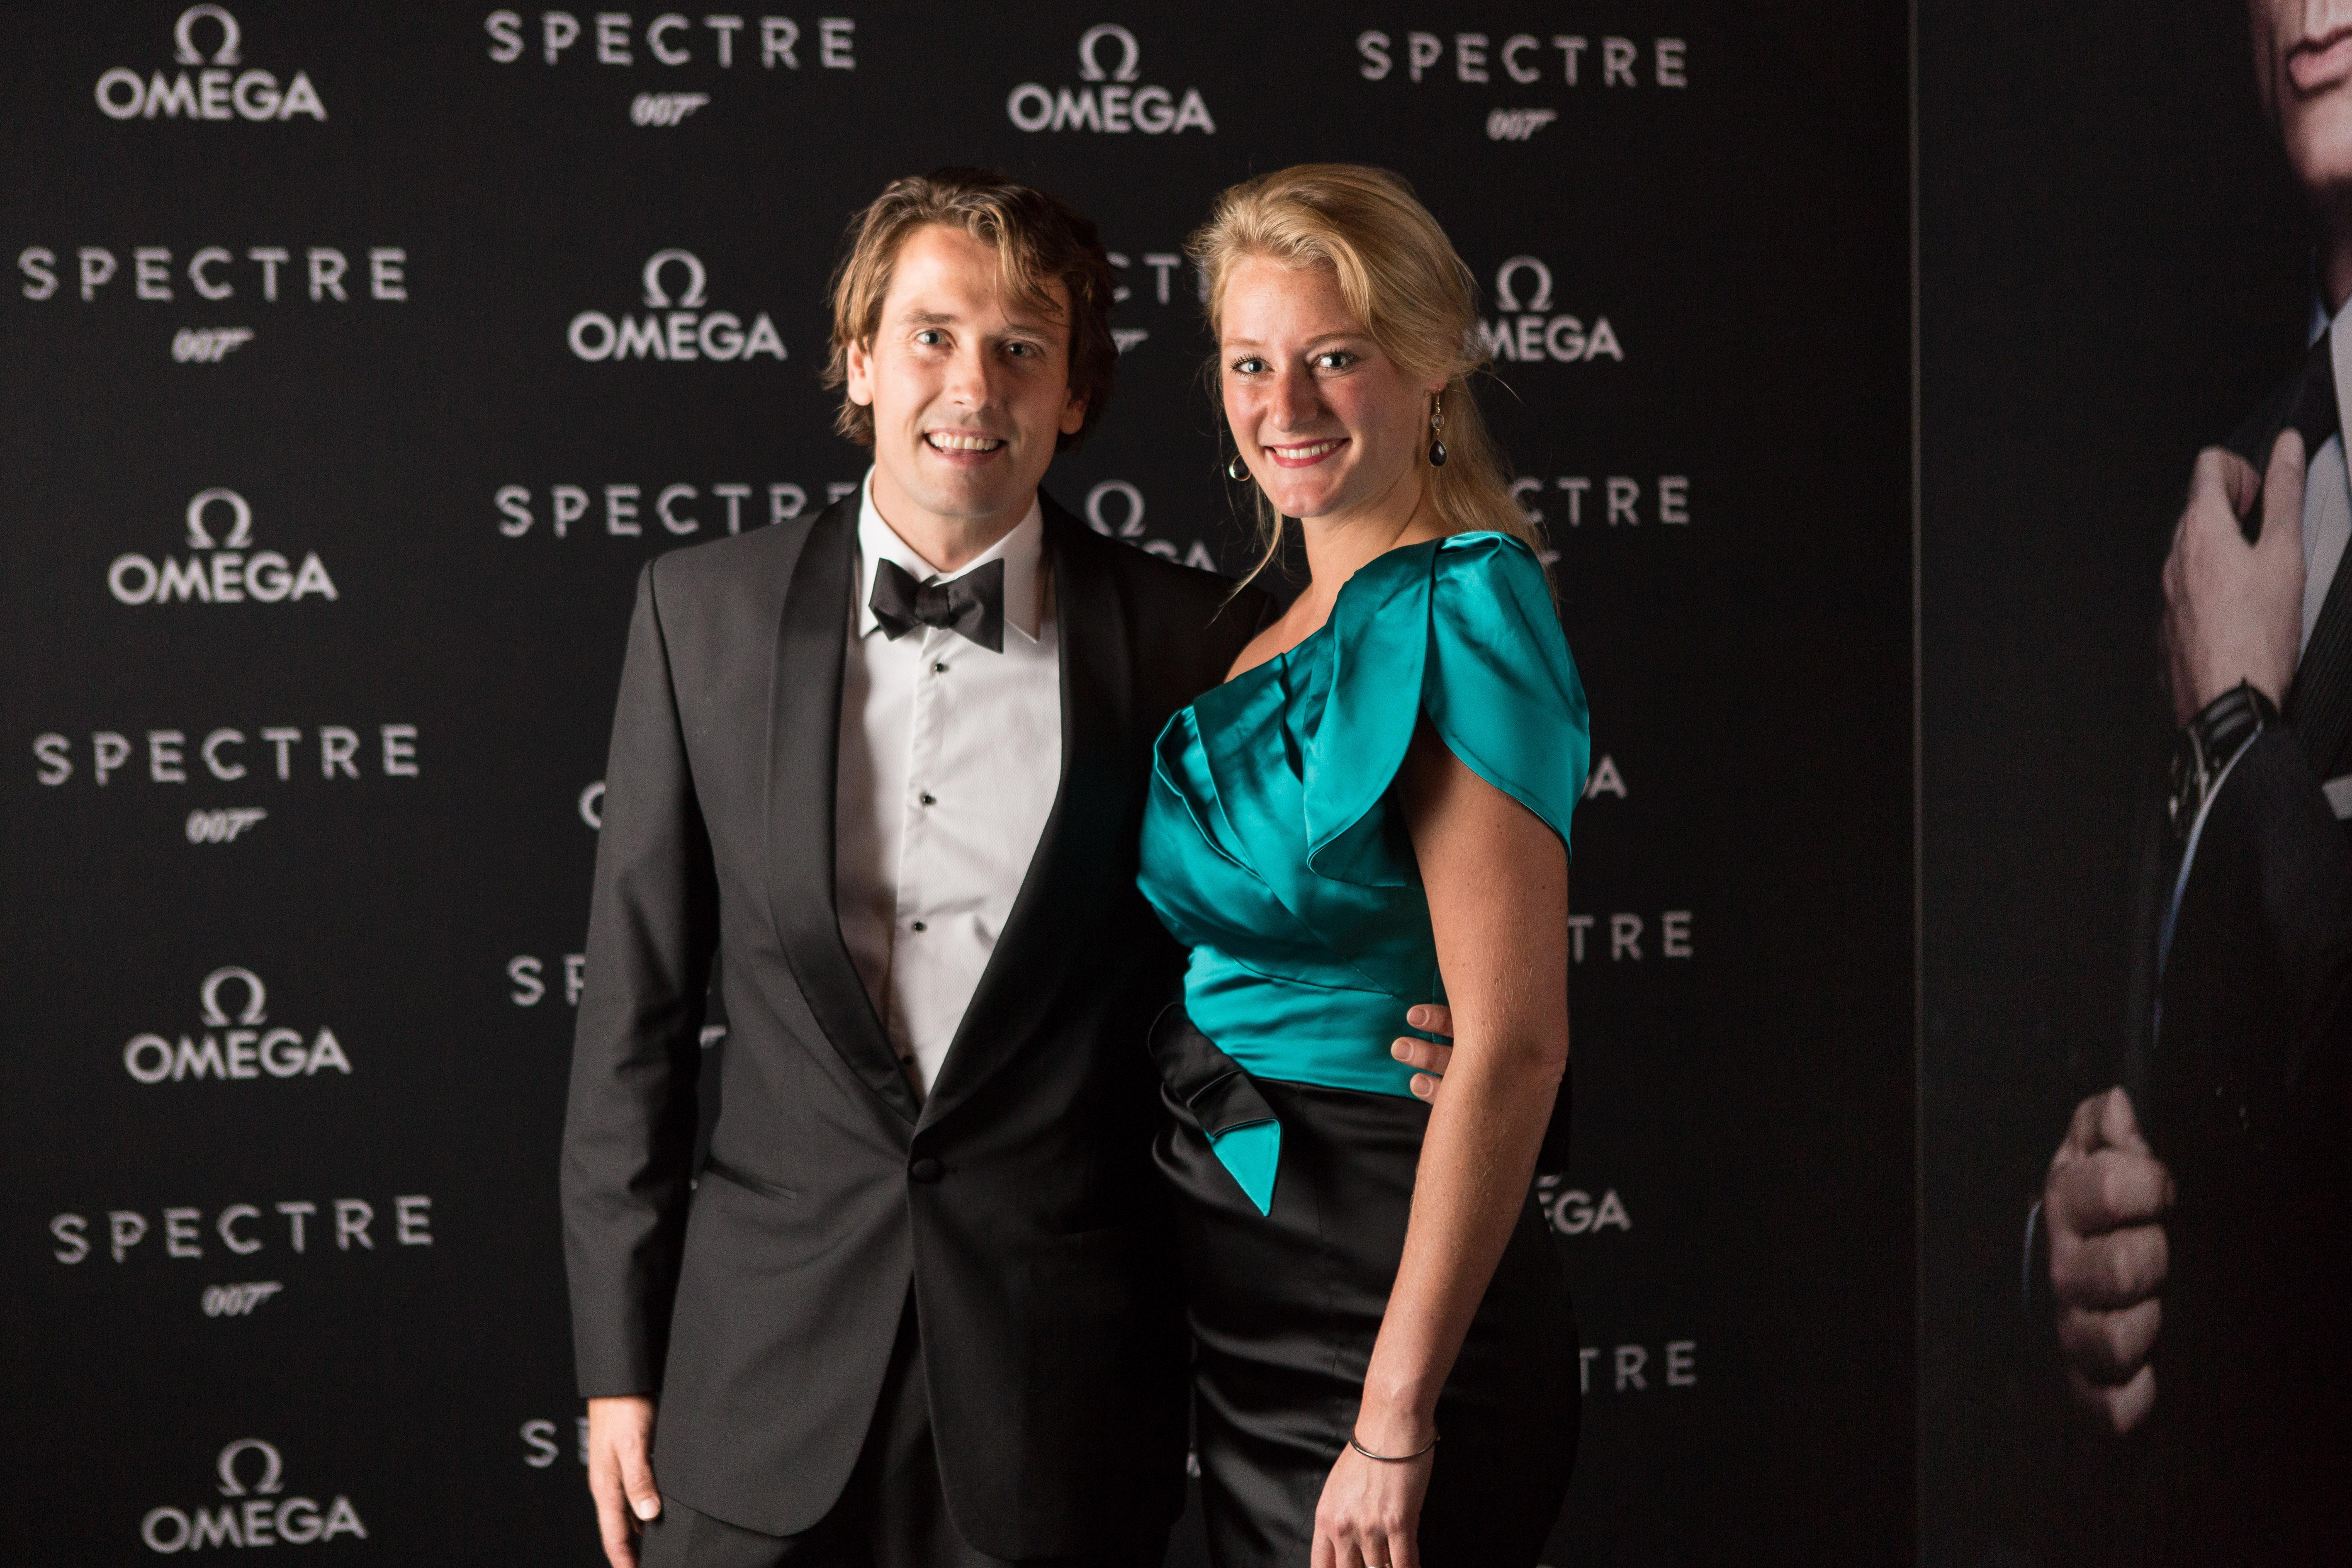 spectre-omega wall-32